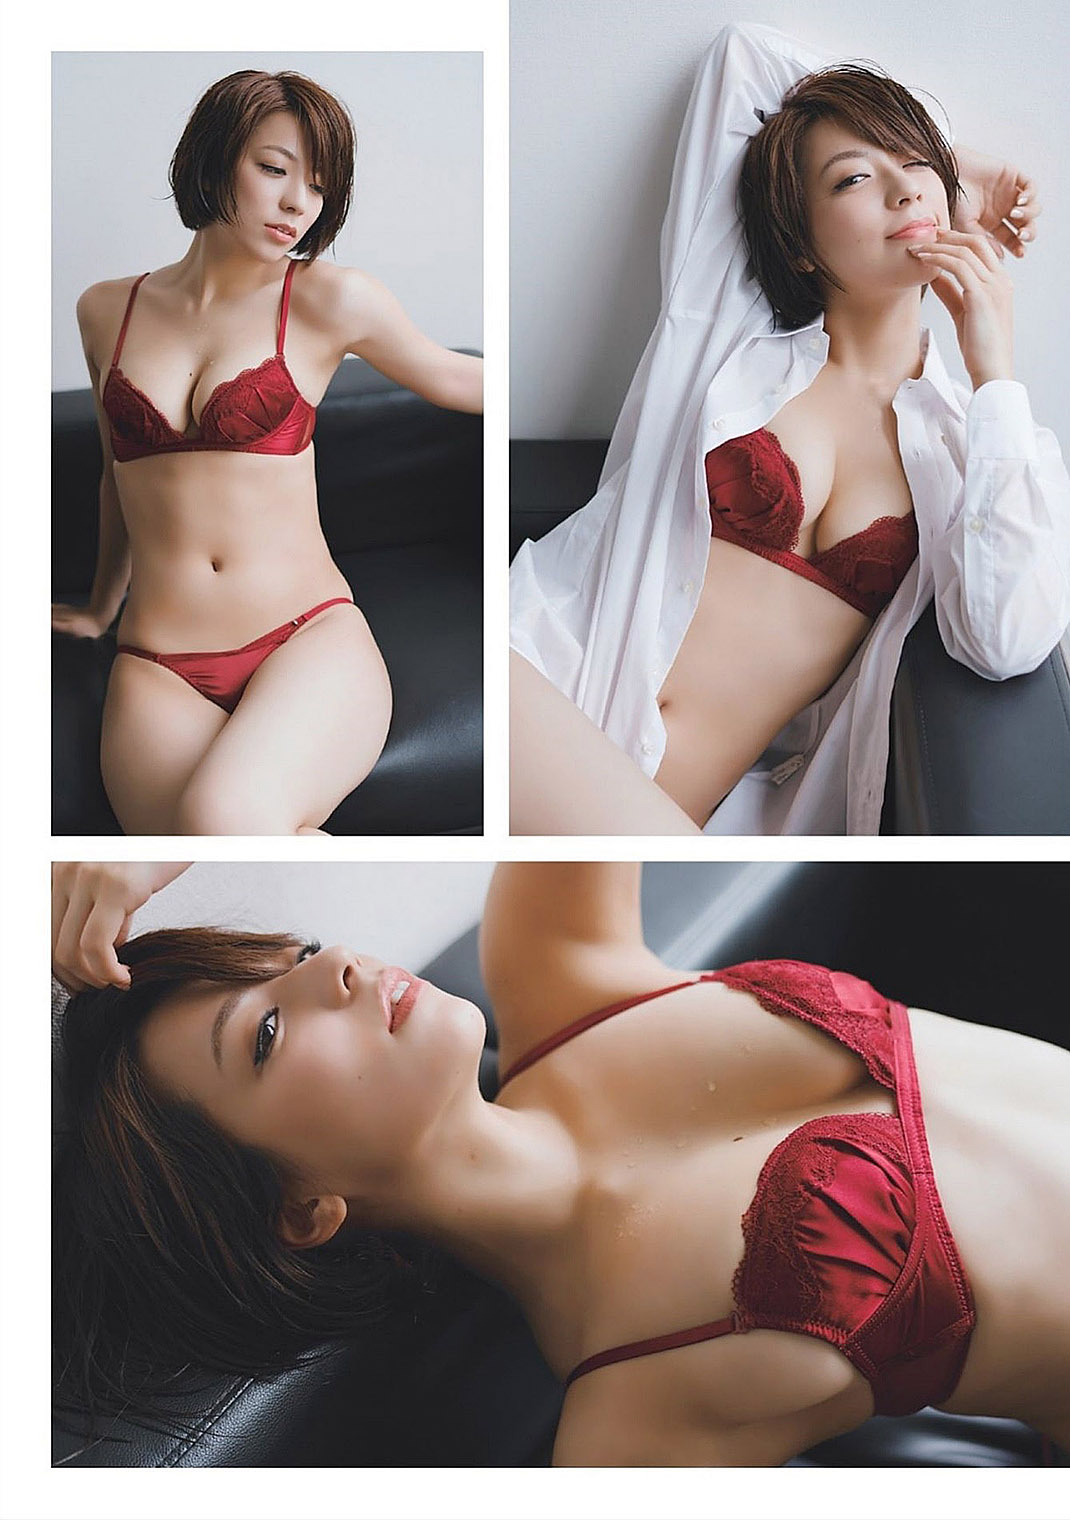 Mayu Koseta Girls 3 2019 07.jpg